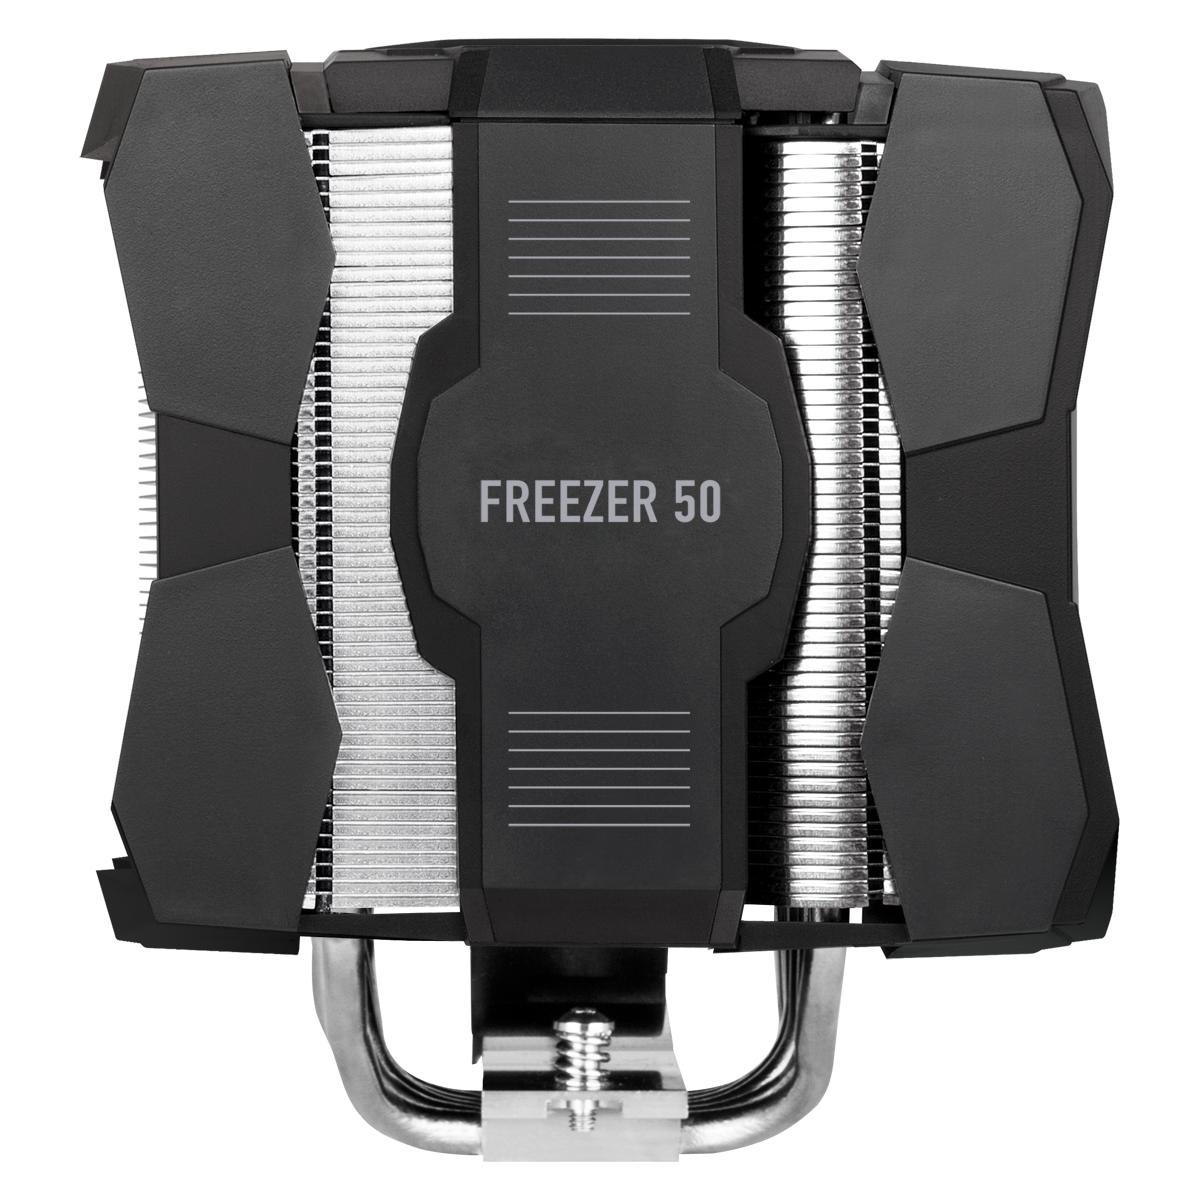 Freezer 50